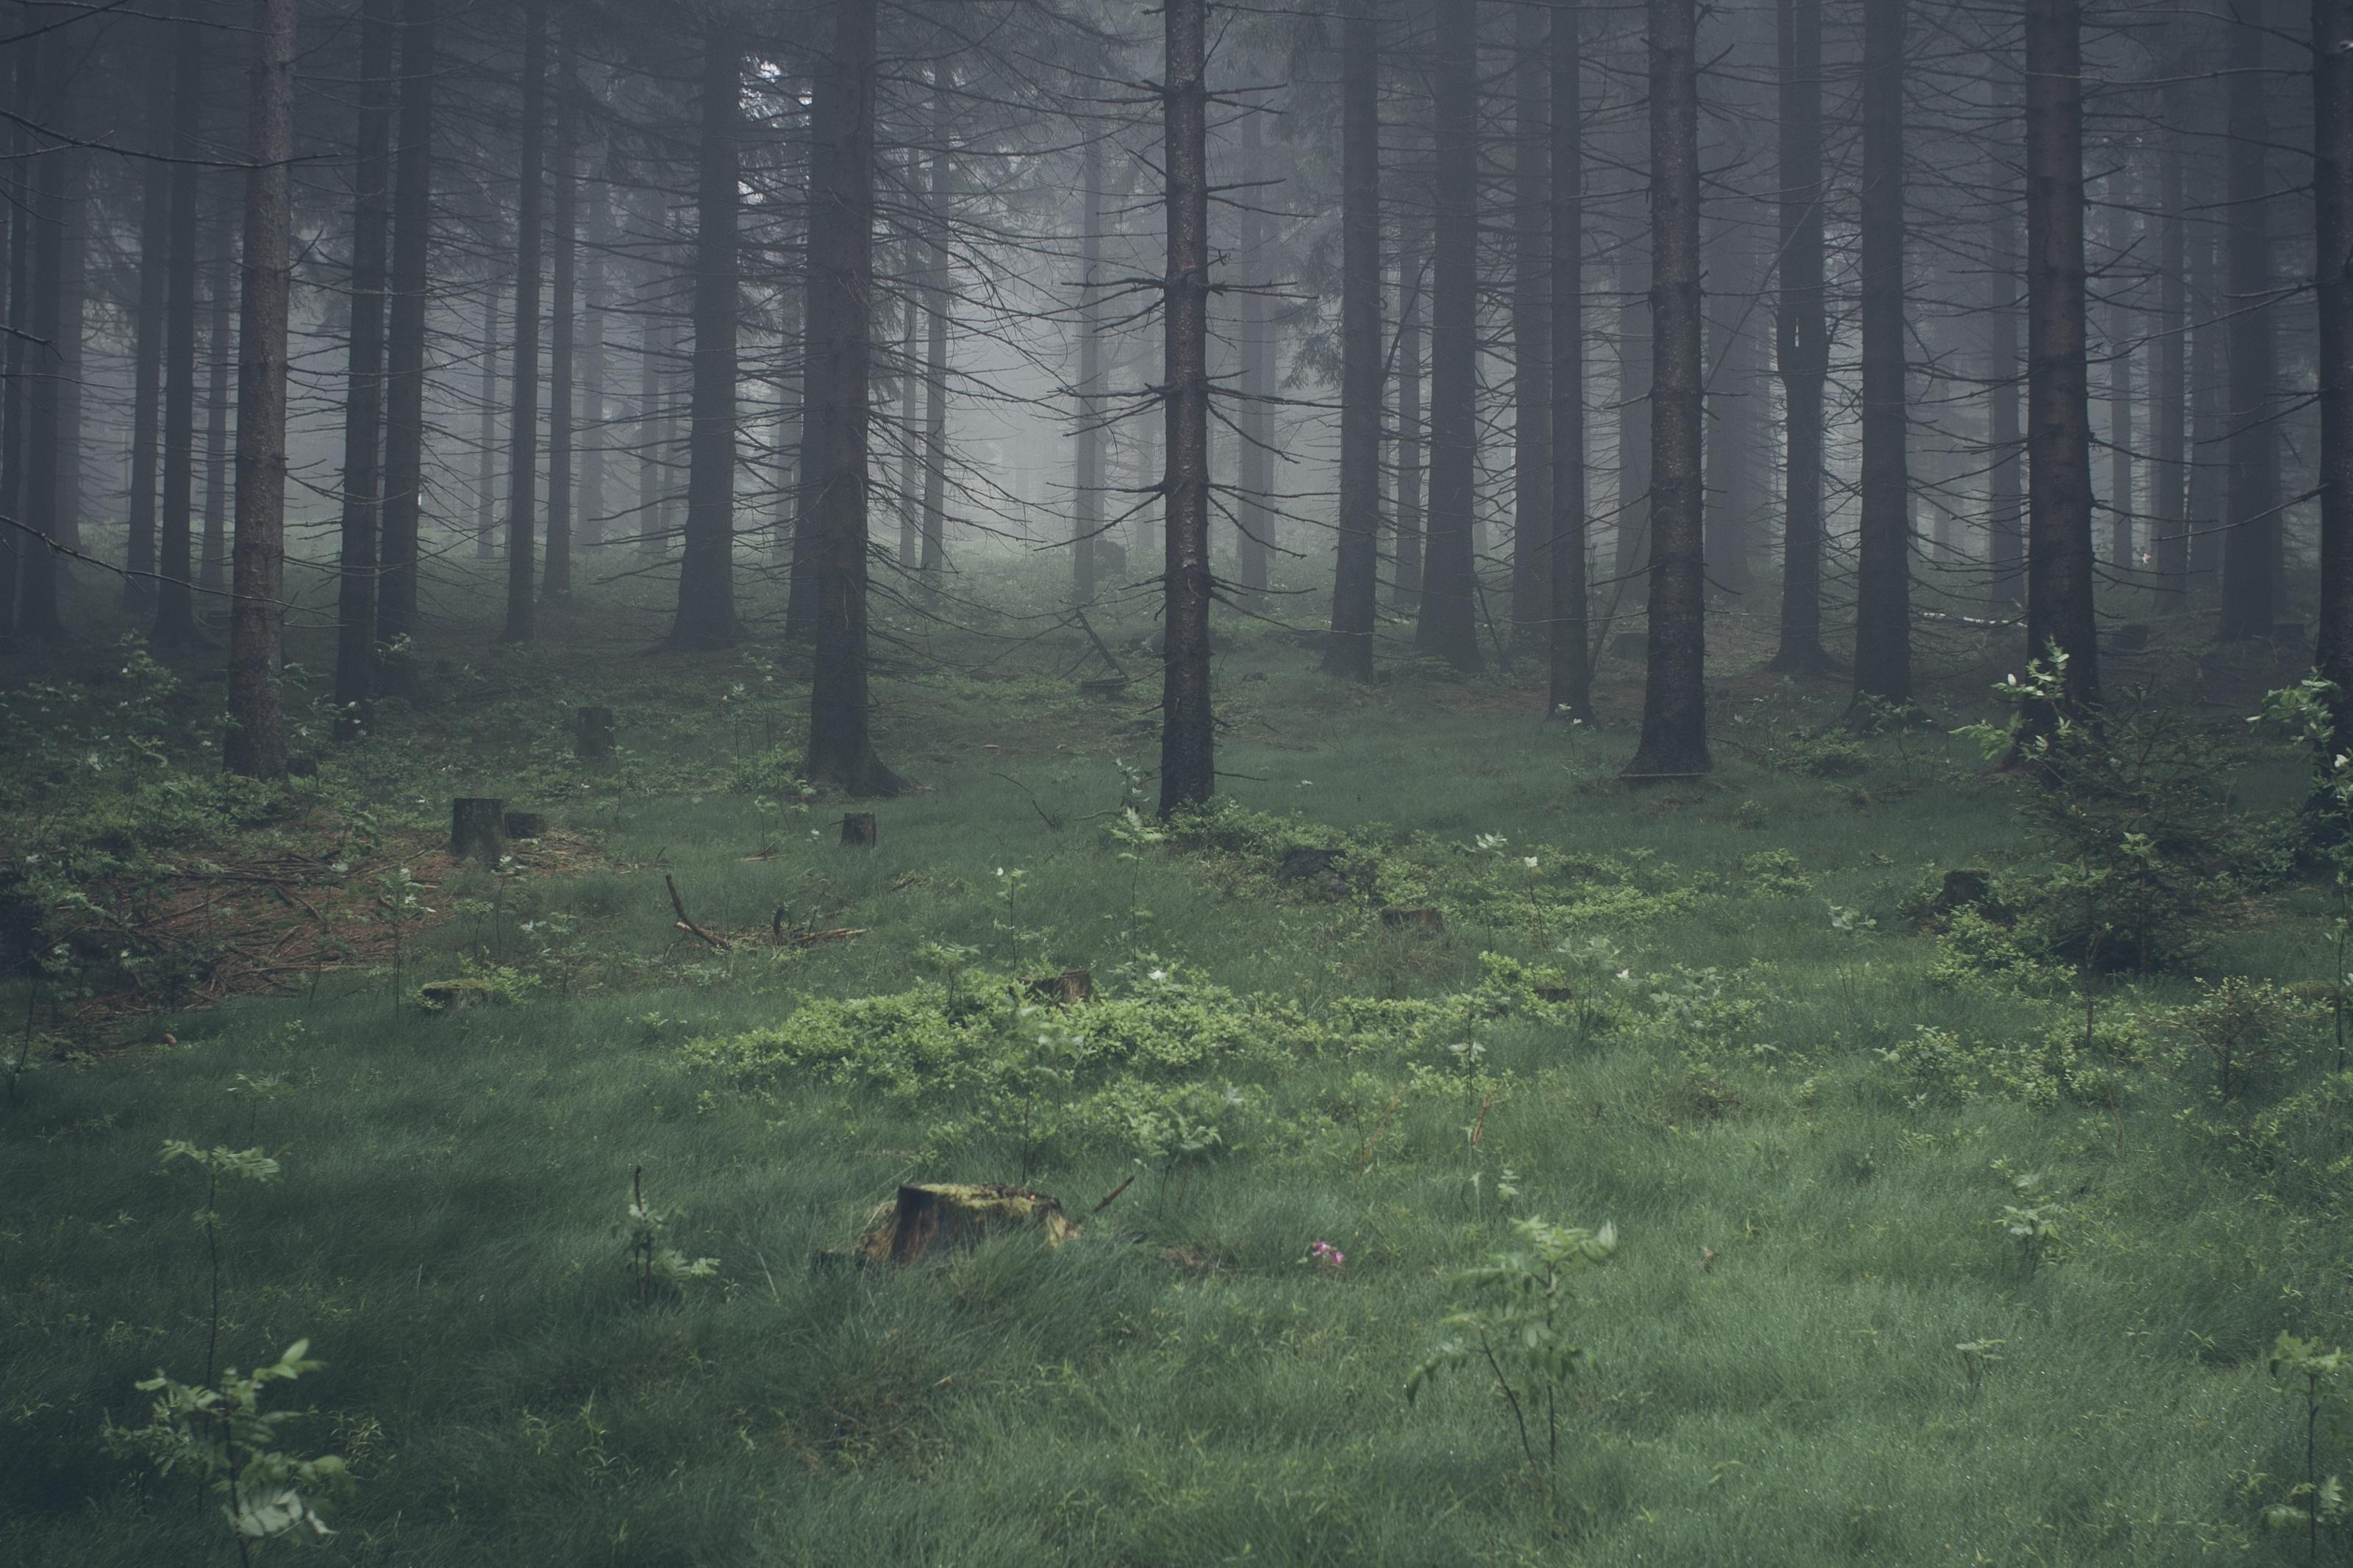 Green Woods Aesthetic